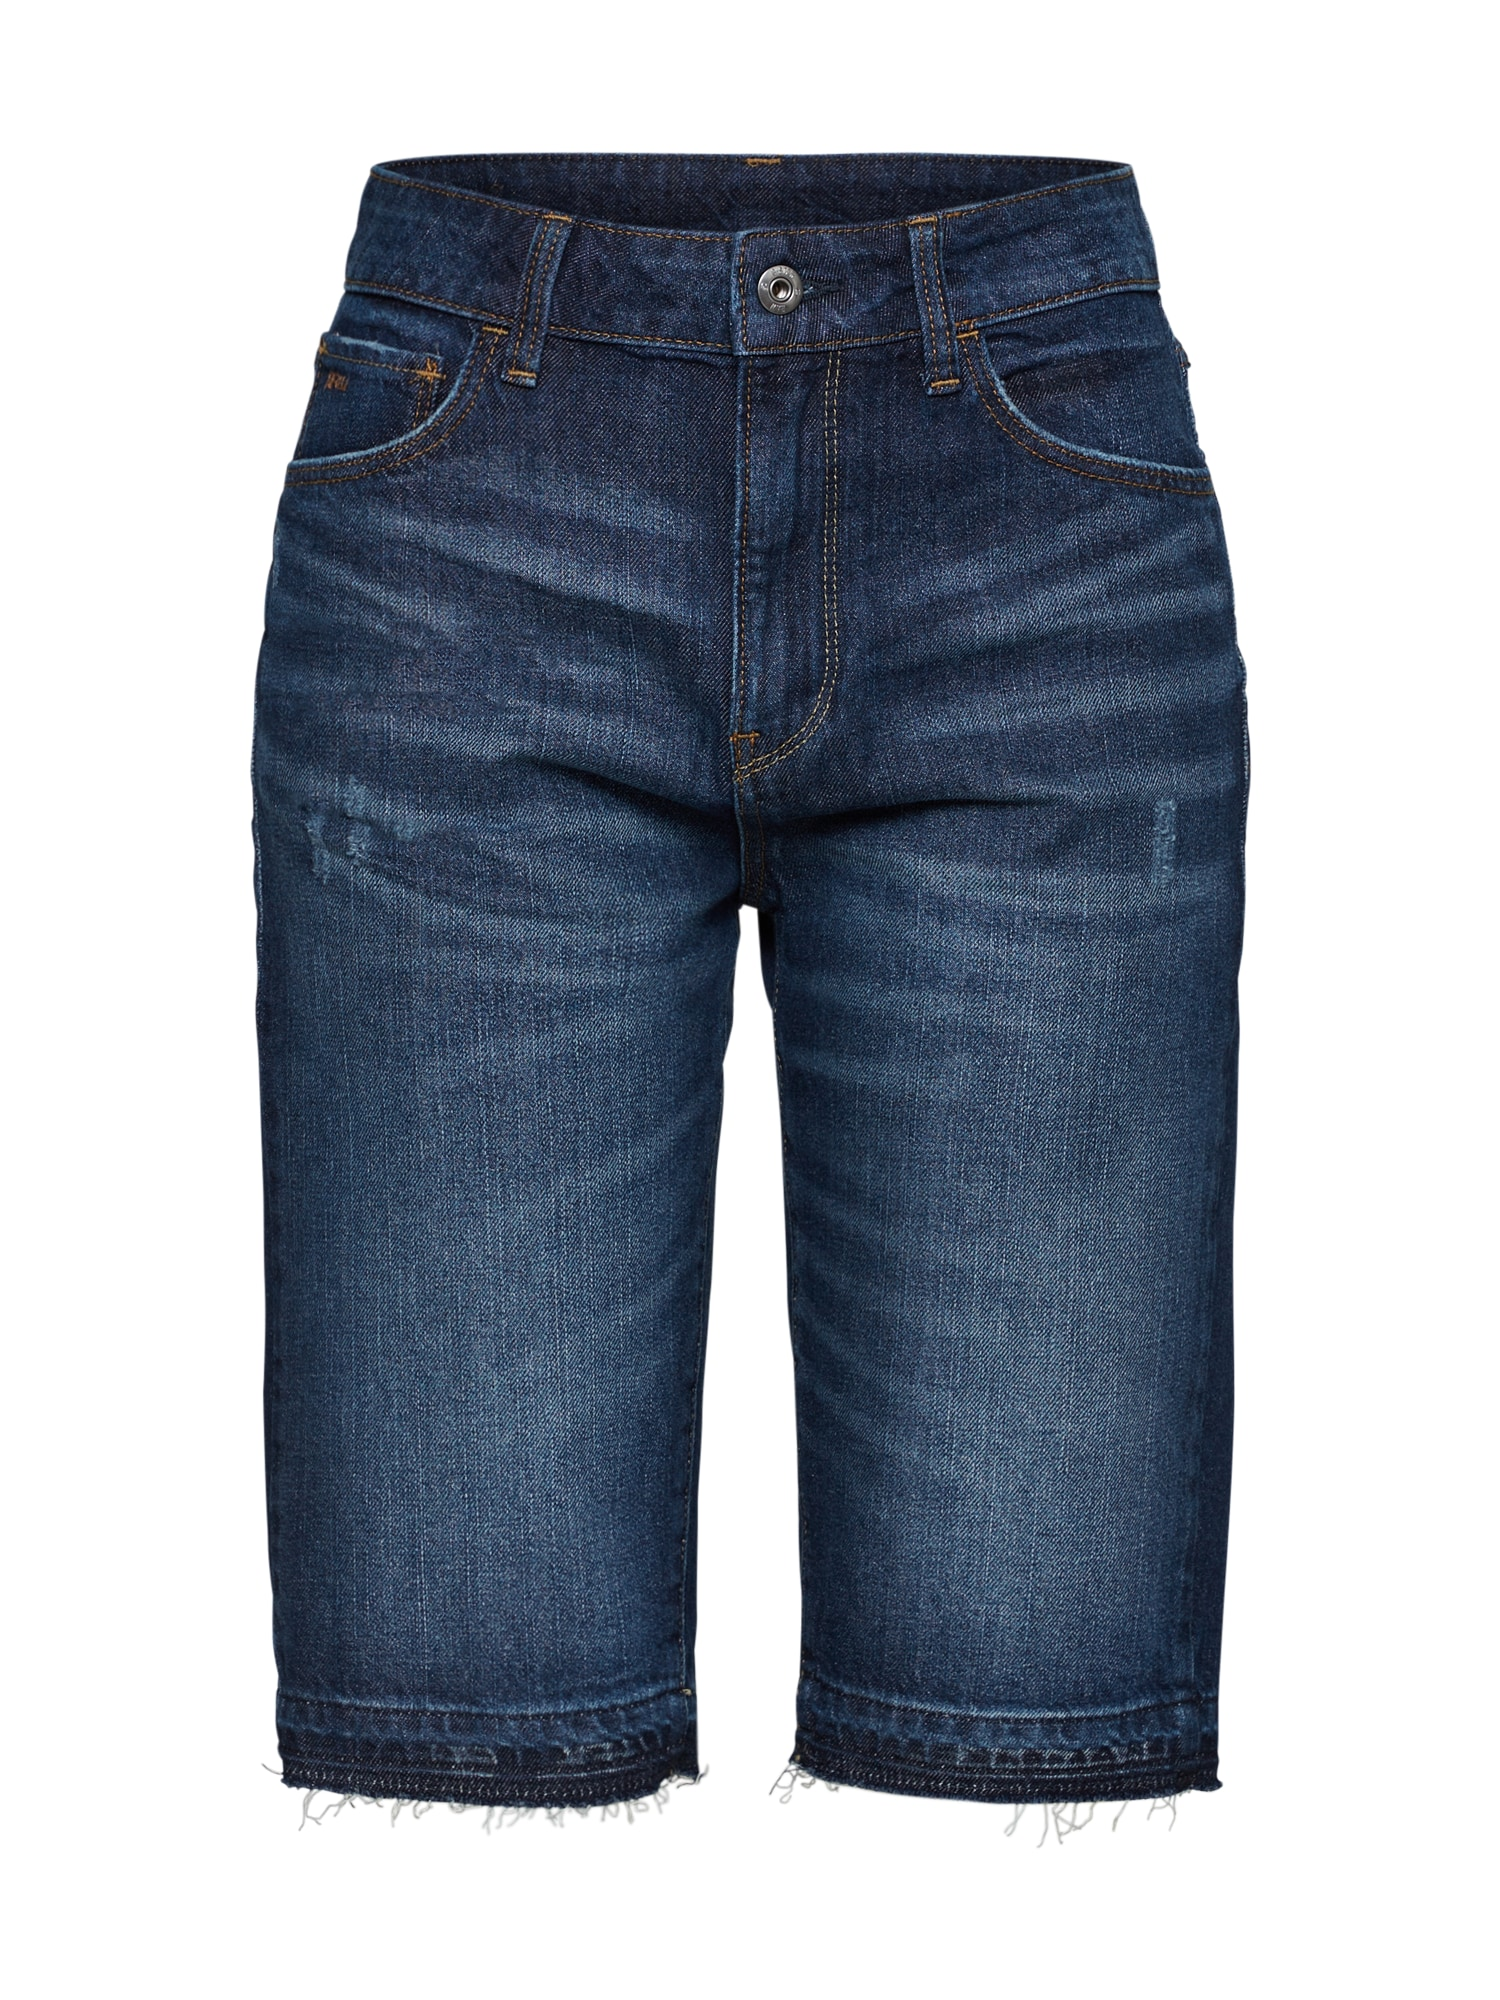 Džíny 3301 High Straight Short rp Wmn modrá džínovina G-STAR RAW